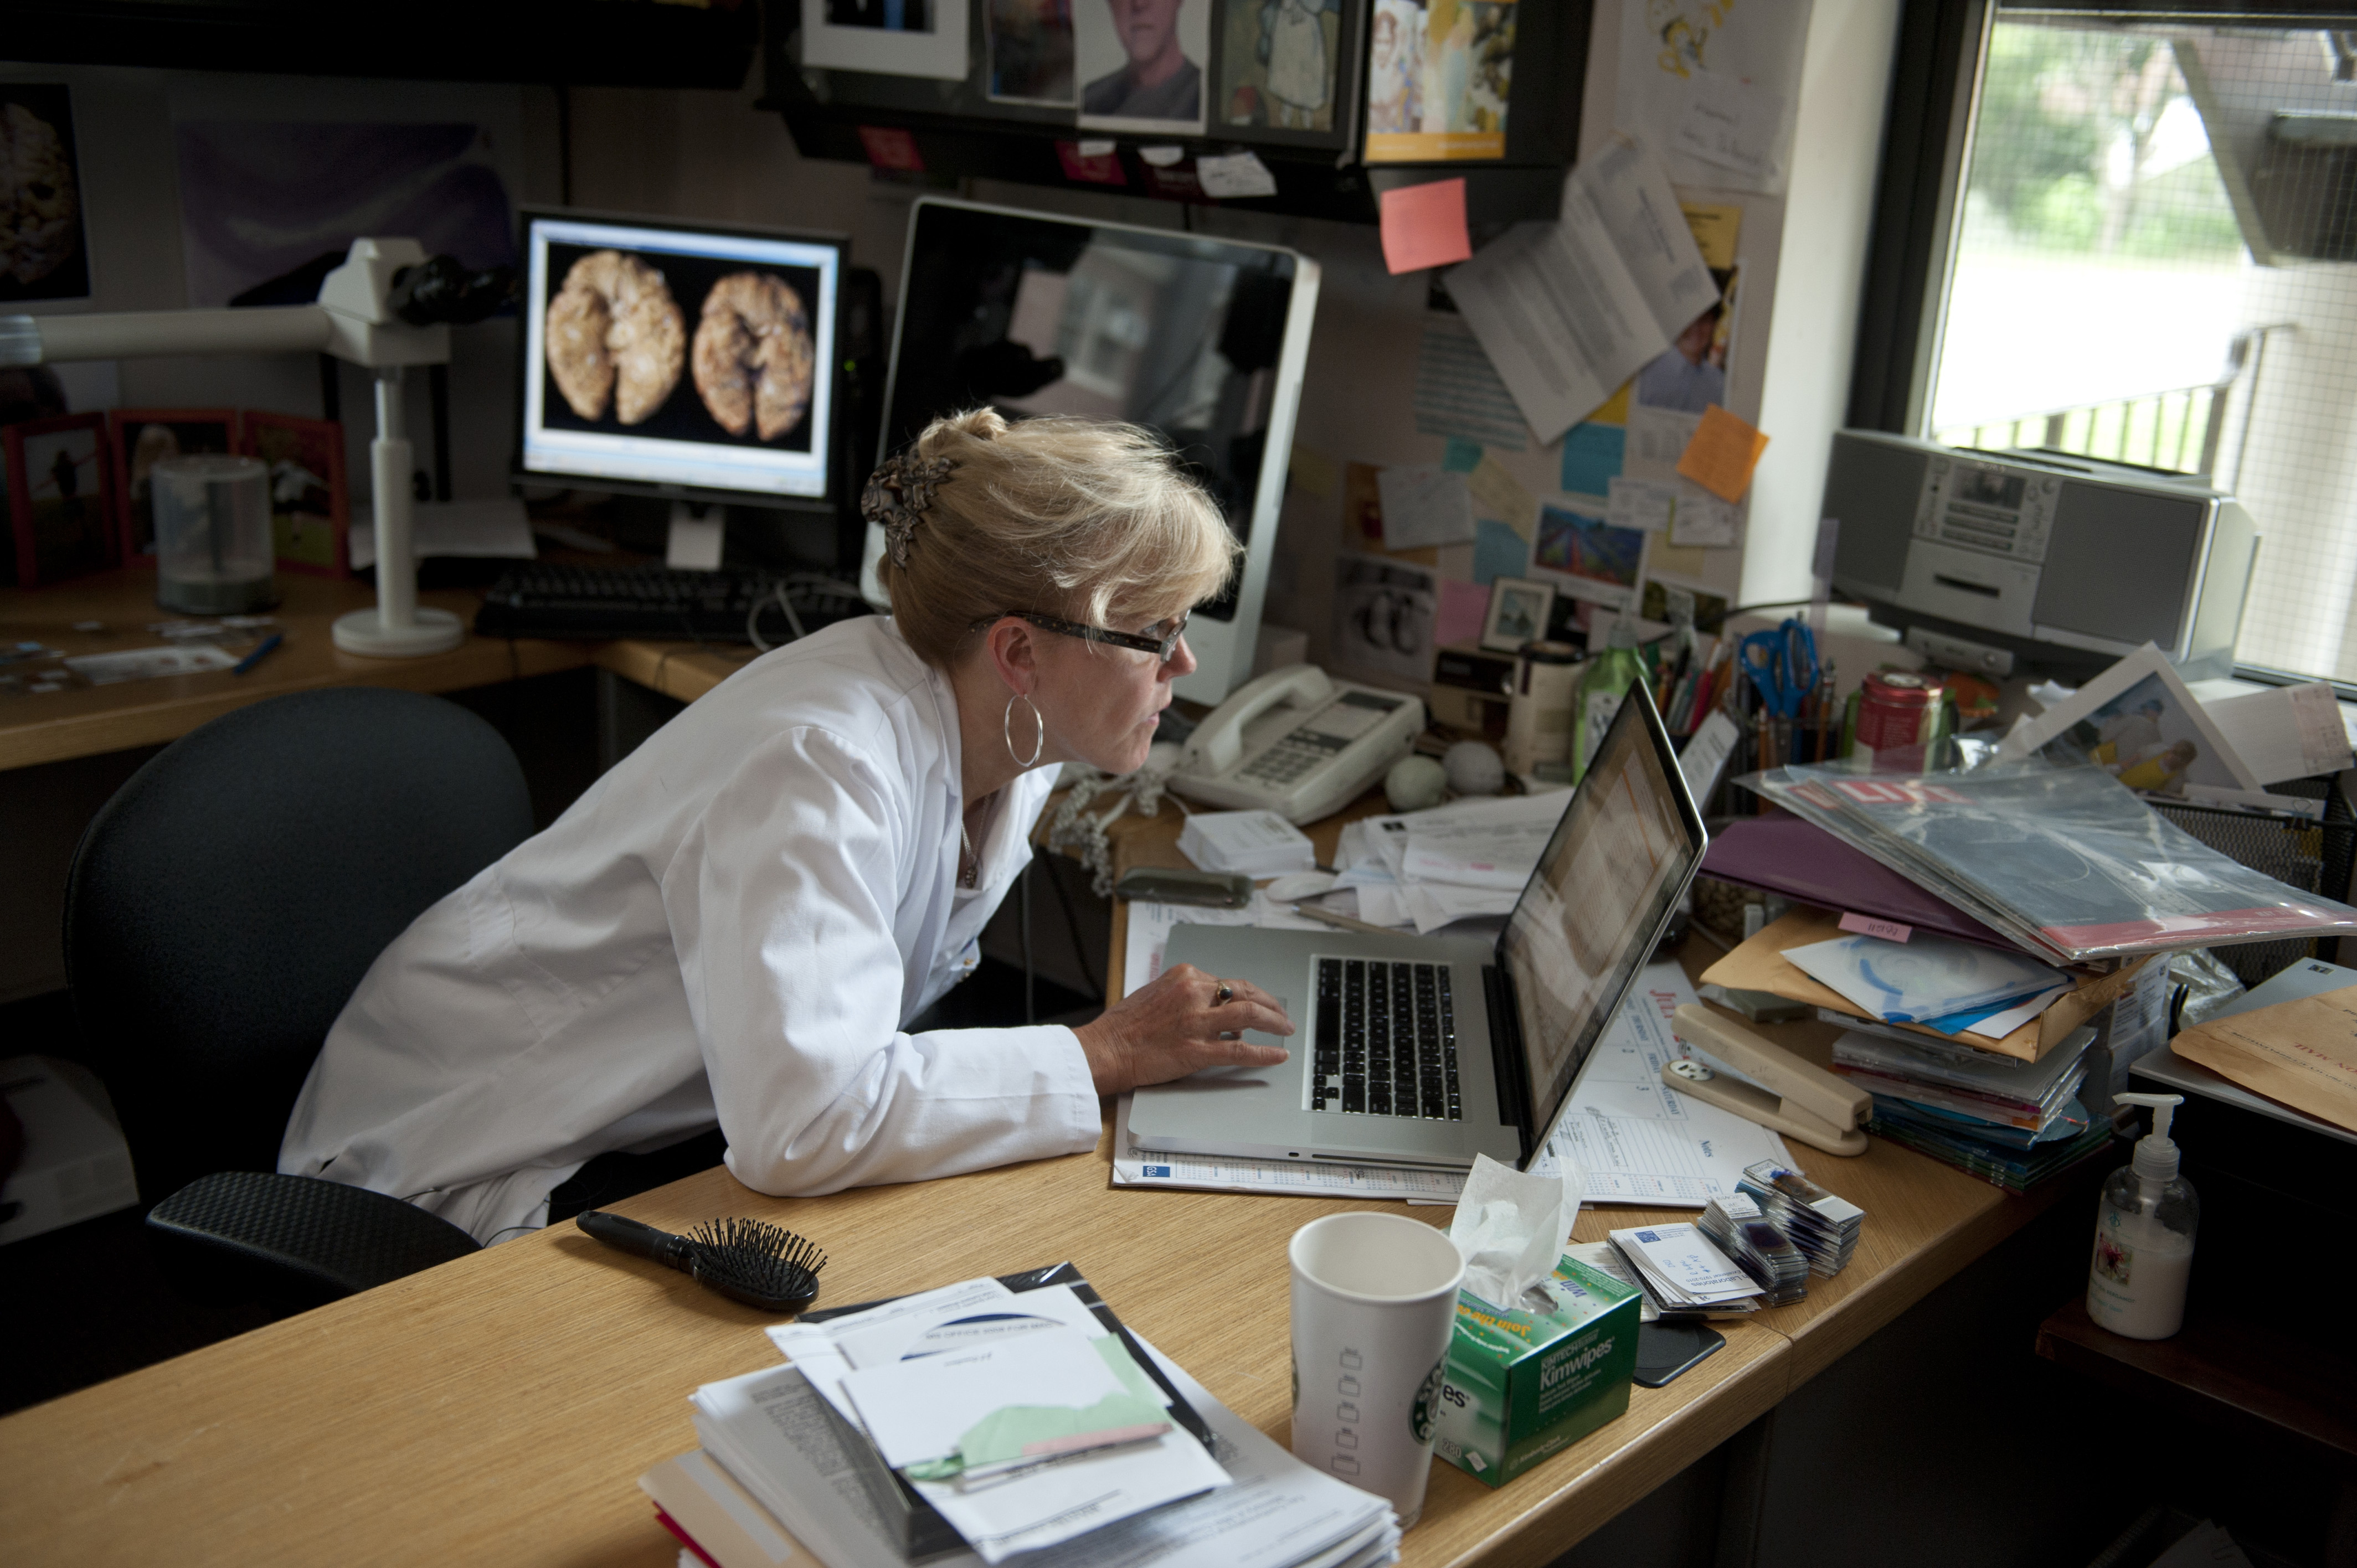 Head Examiner | The Brink | Boston University